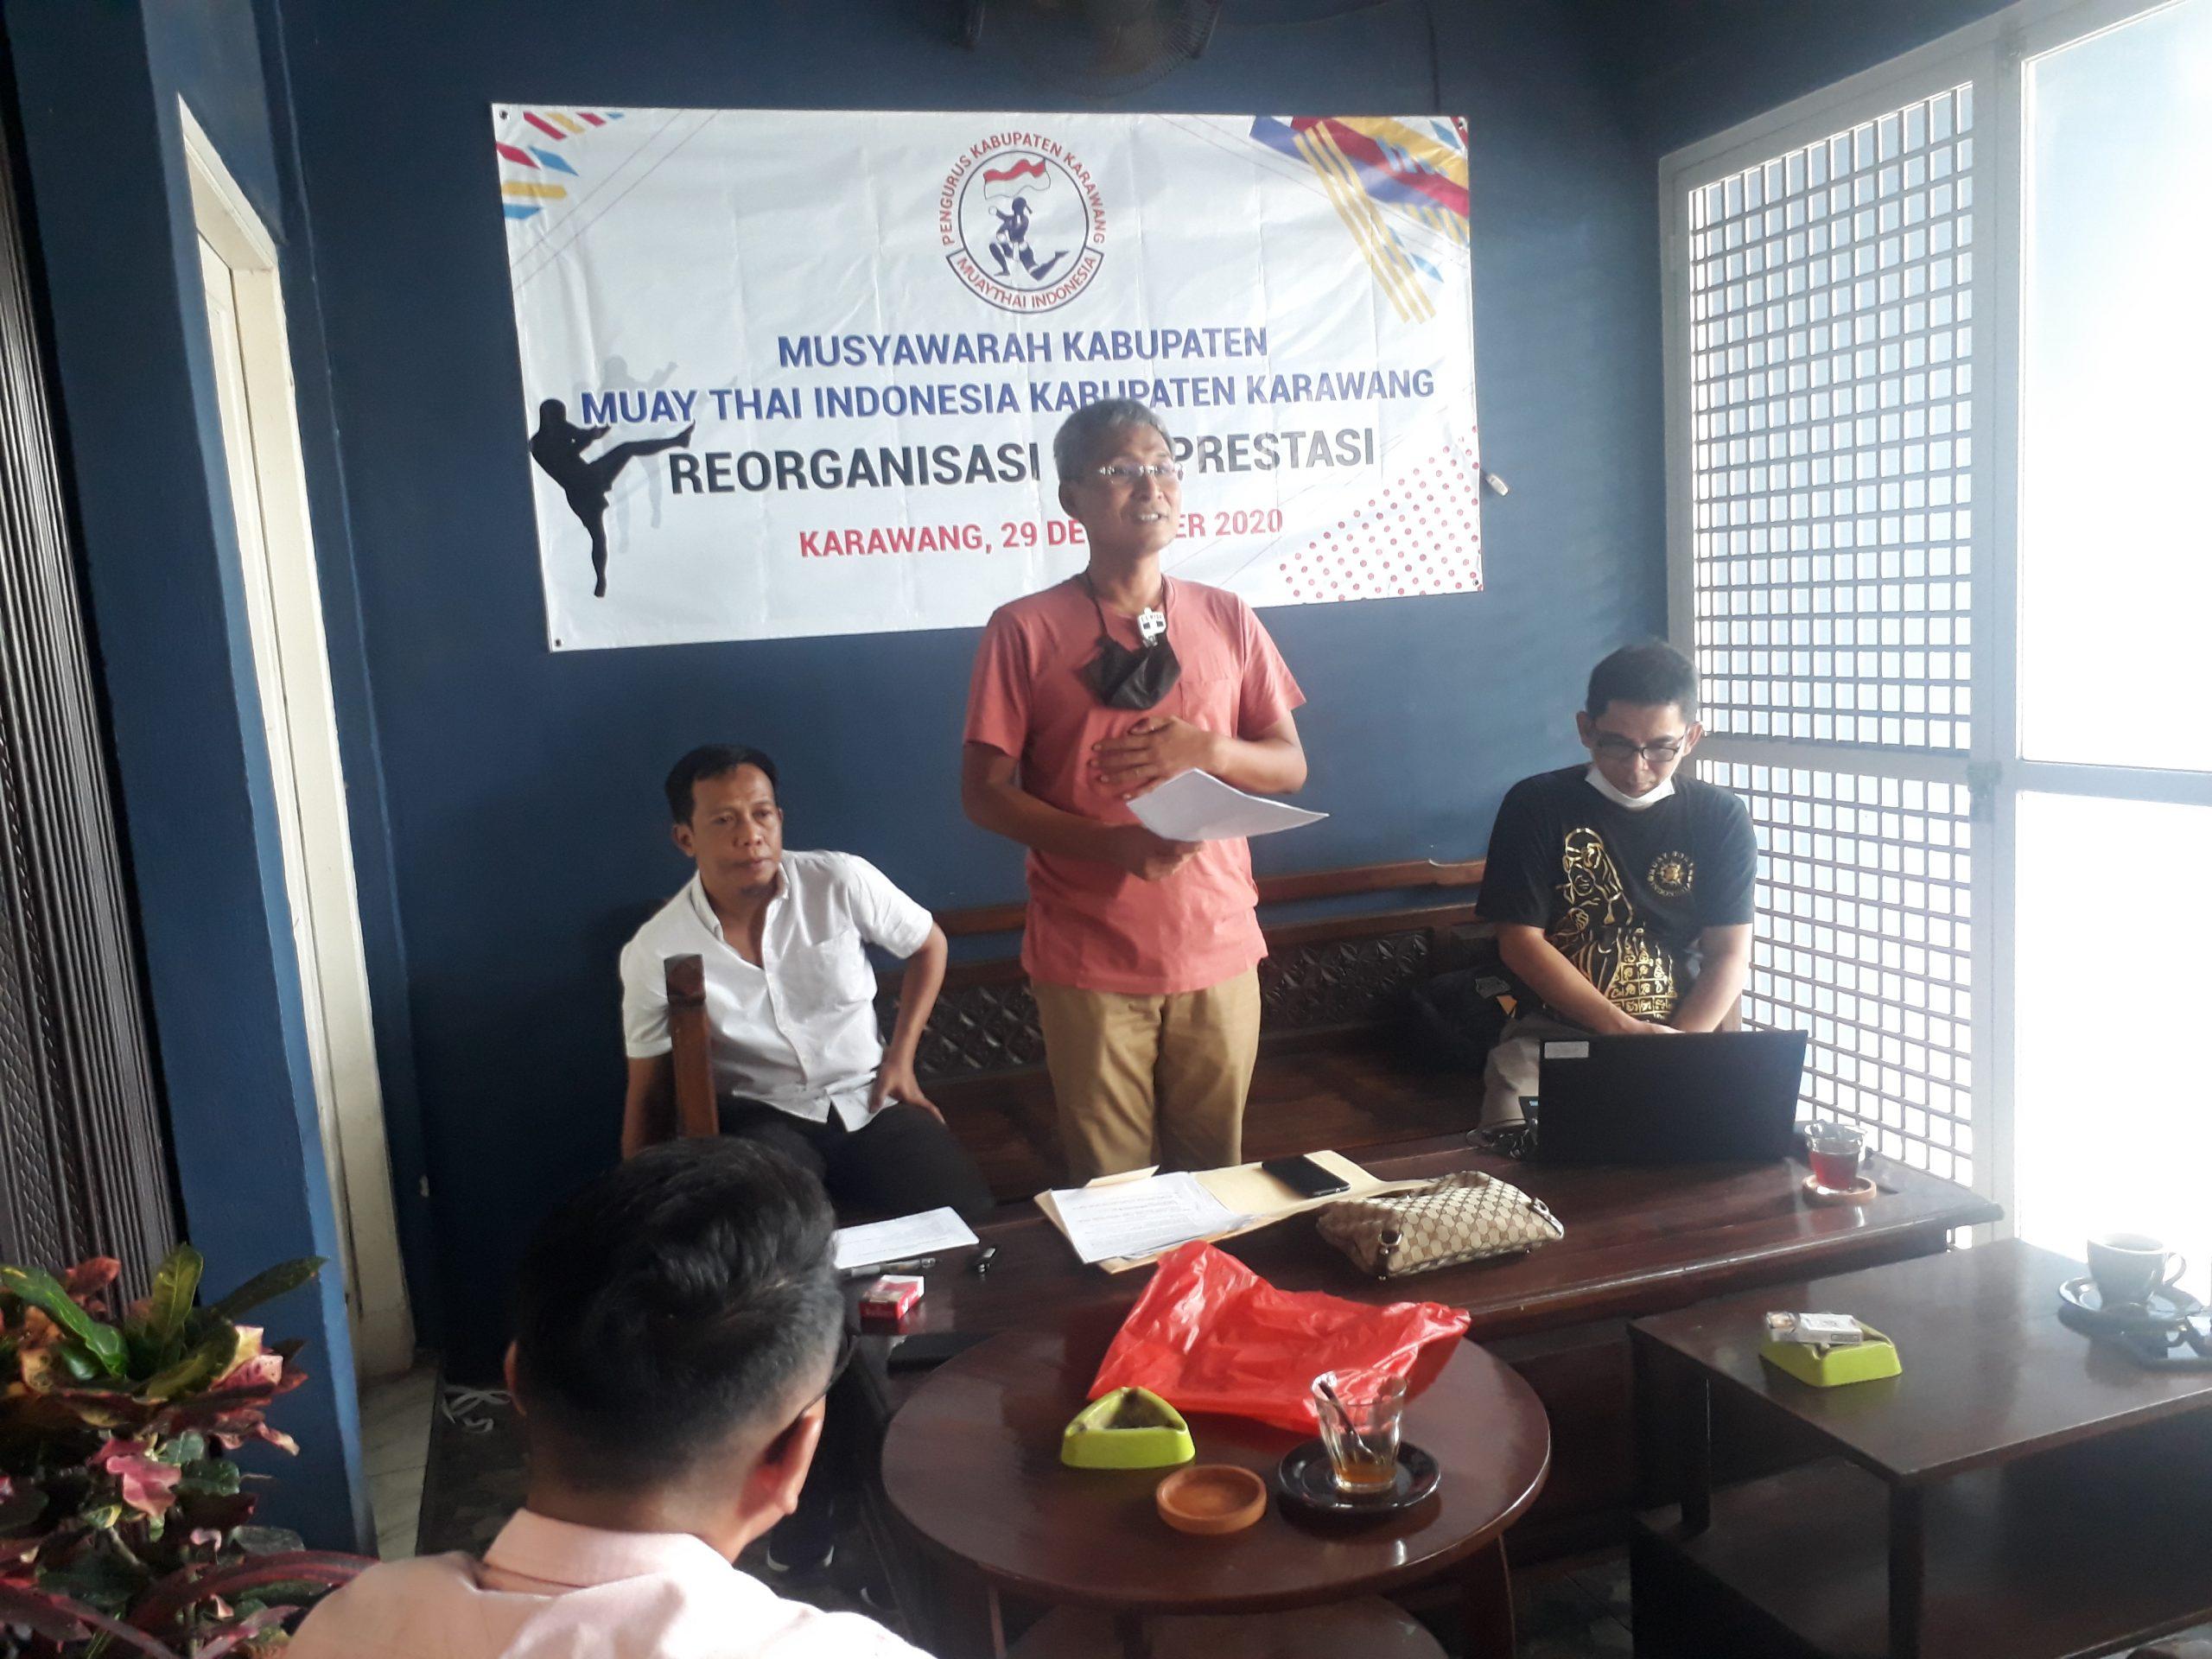 BM Kembali Pimpin Muaythai Karawang, Gerak Cepat Jelang Porda Jabar 2022